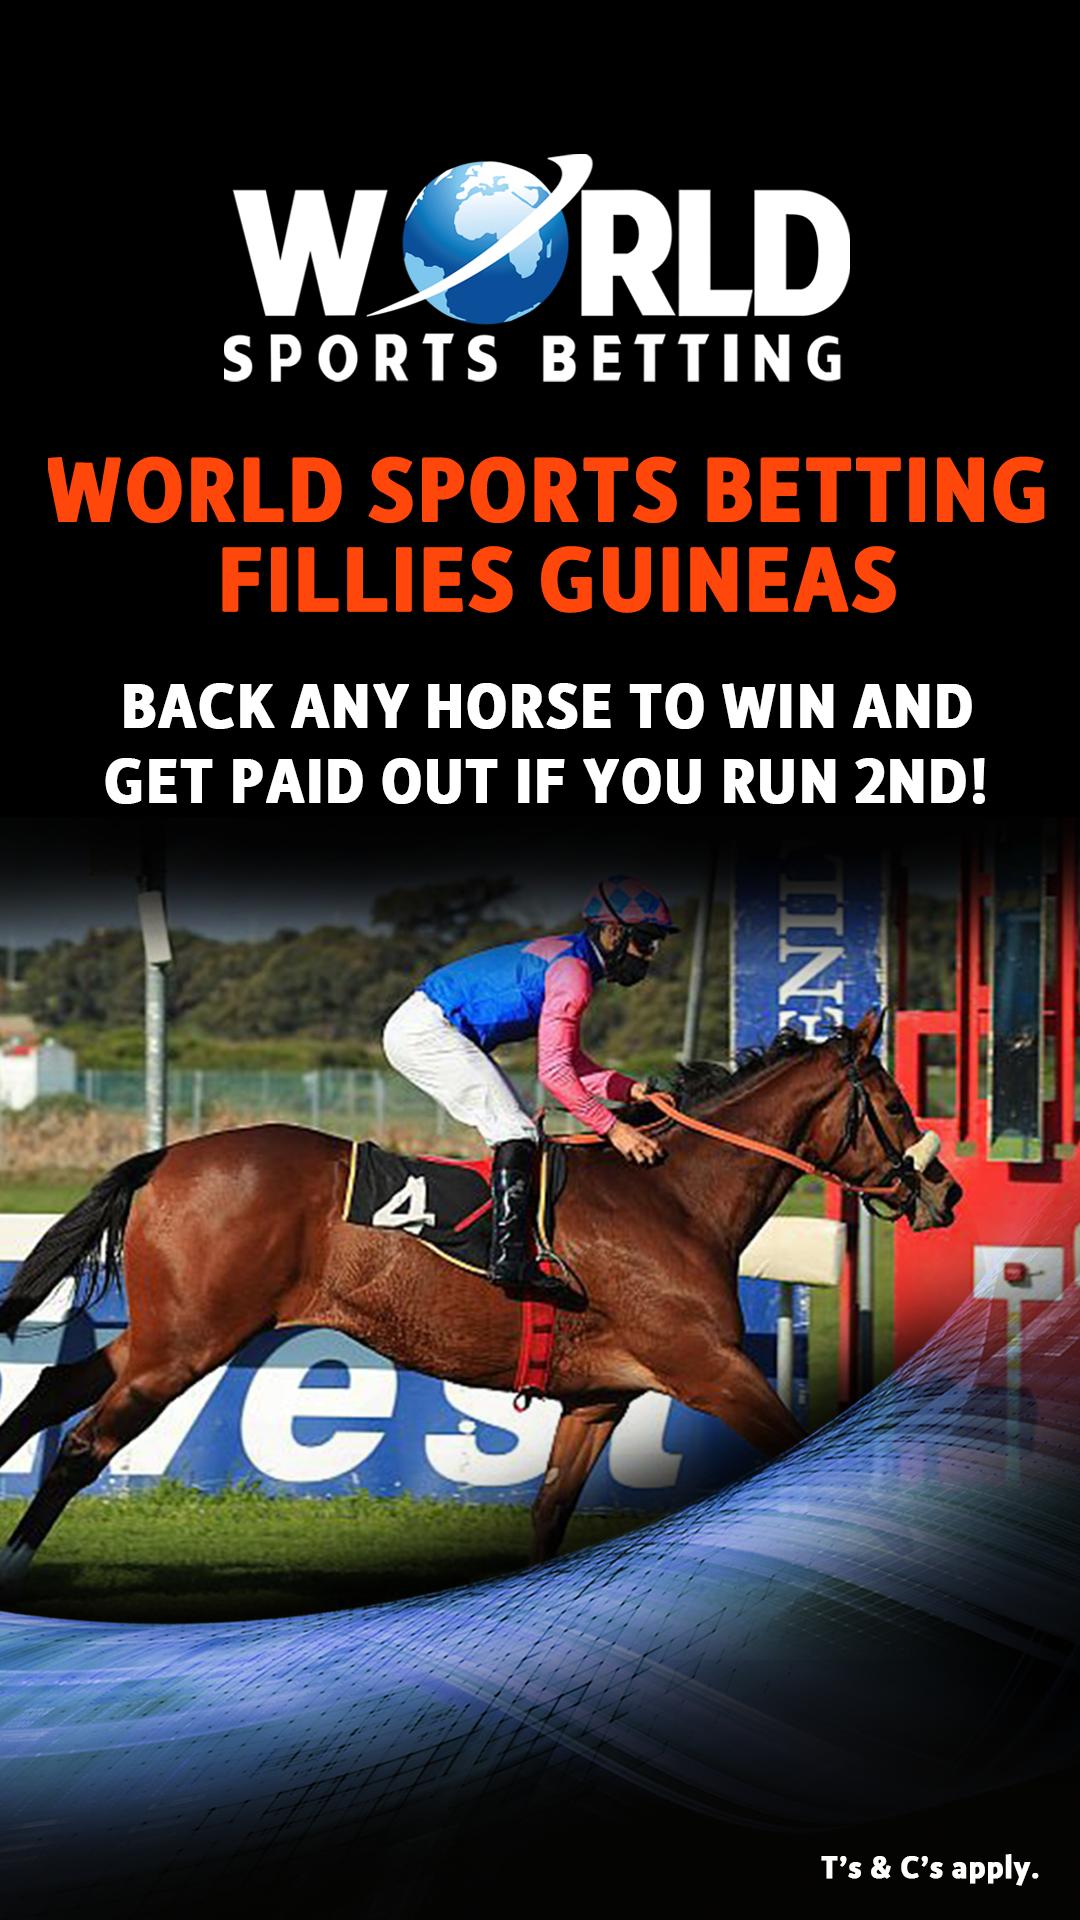 World sports betting horse racing localbitcoins volume